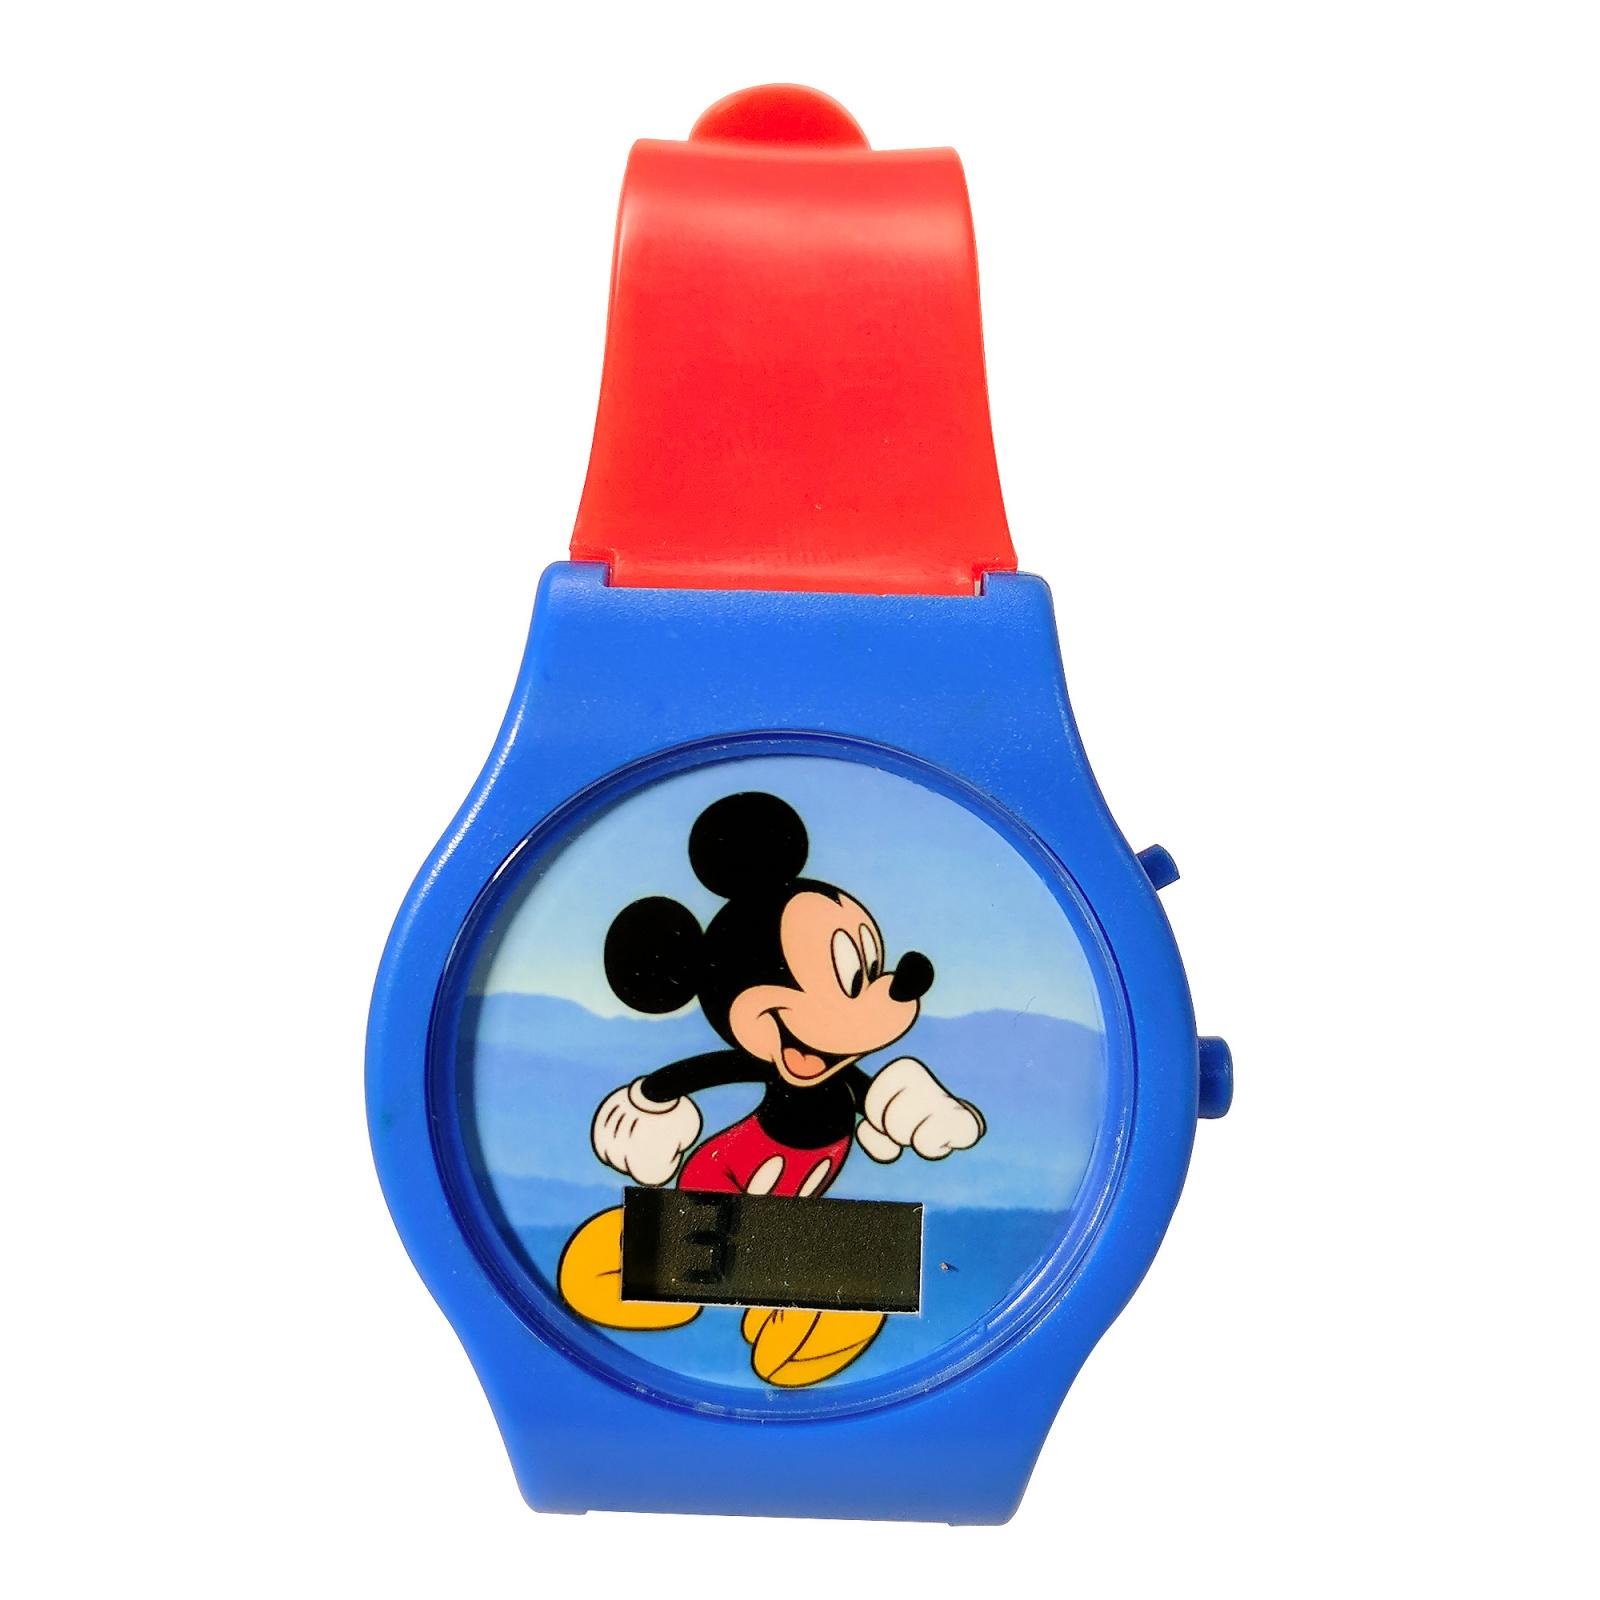 Mickey Digital LCD Wrist Watch Kids Adjustable Strap - Orange